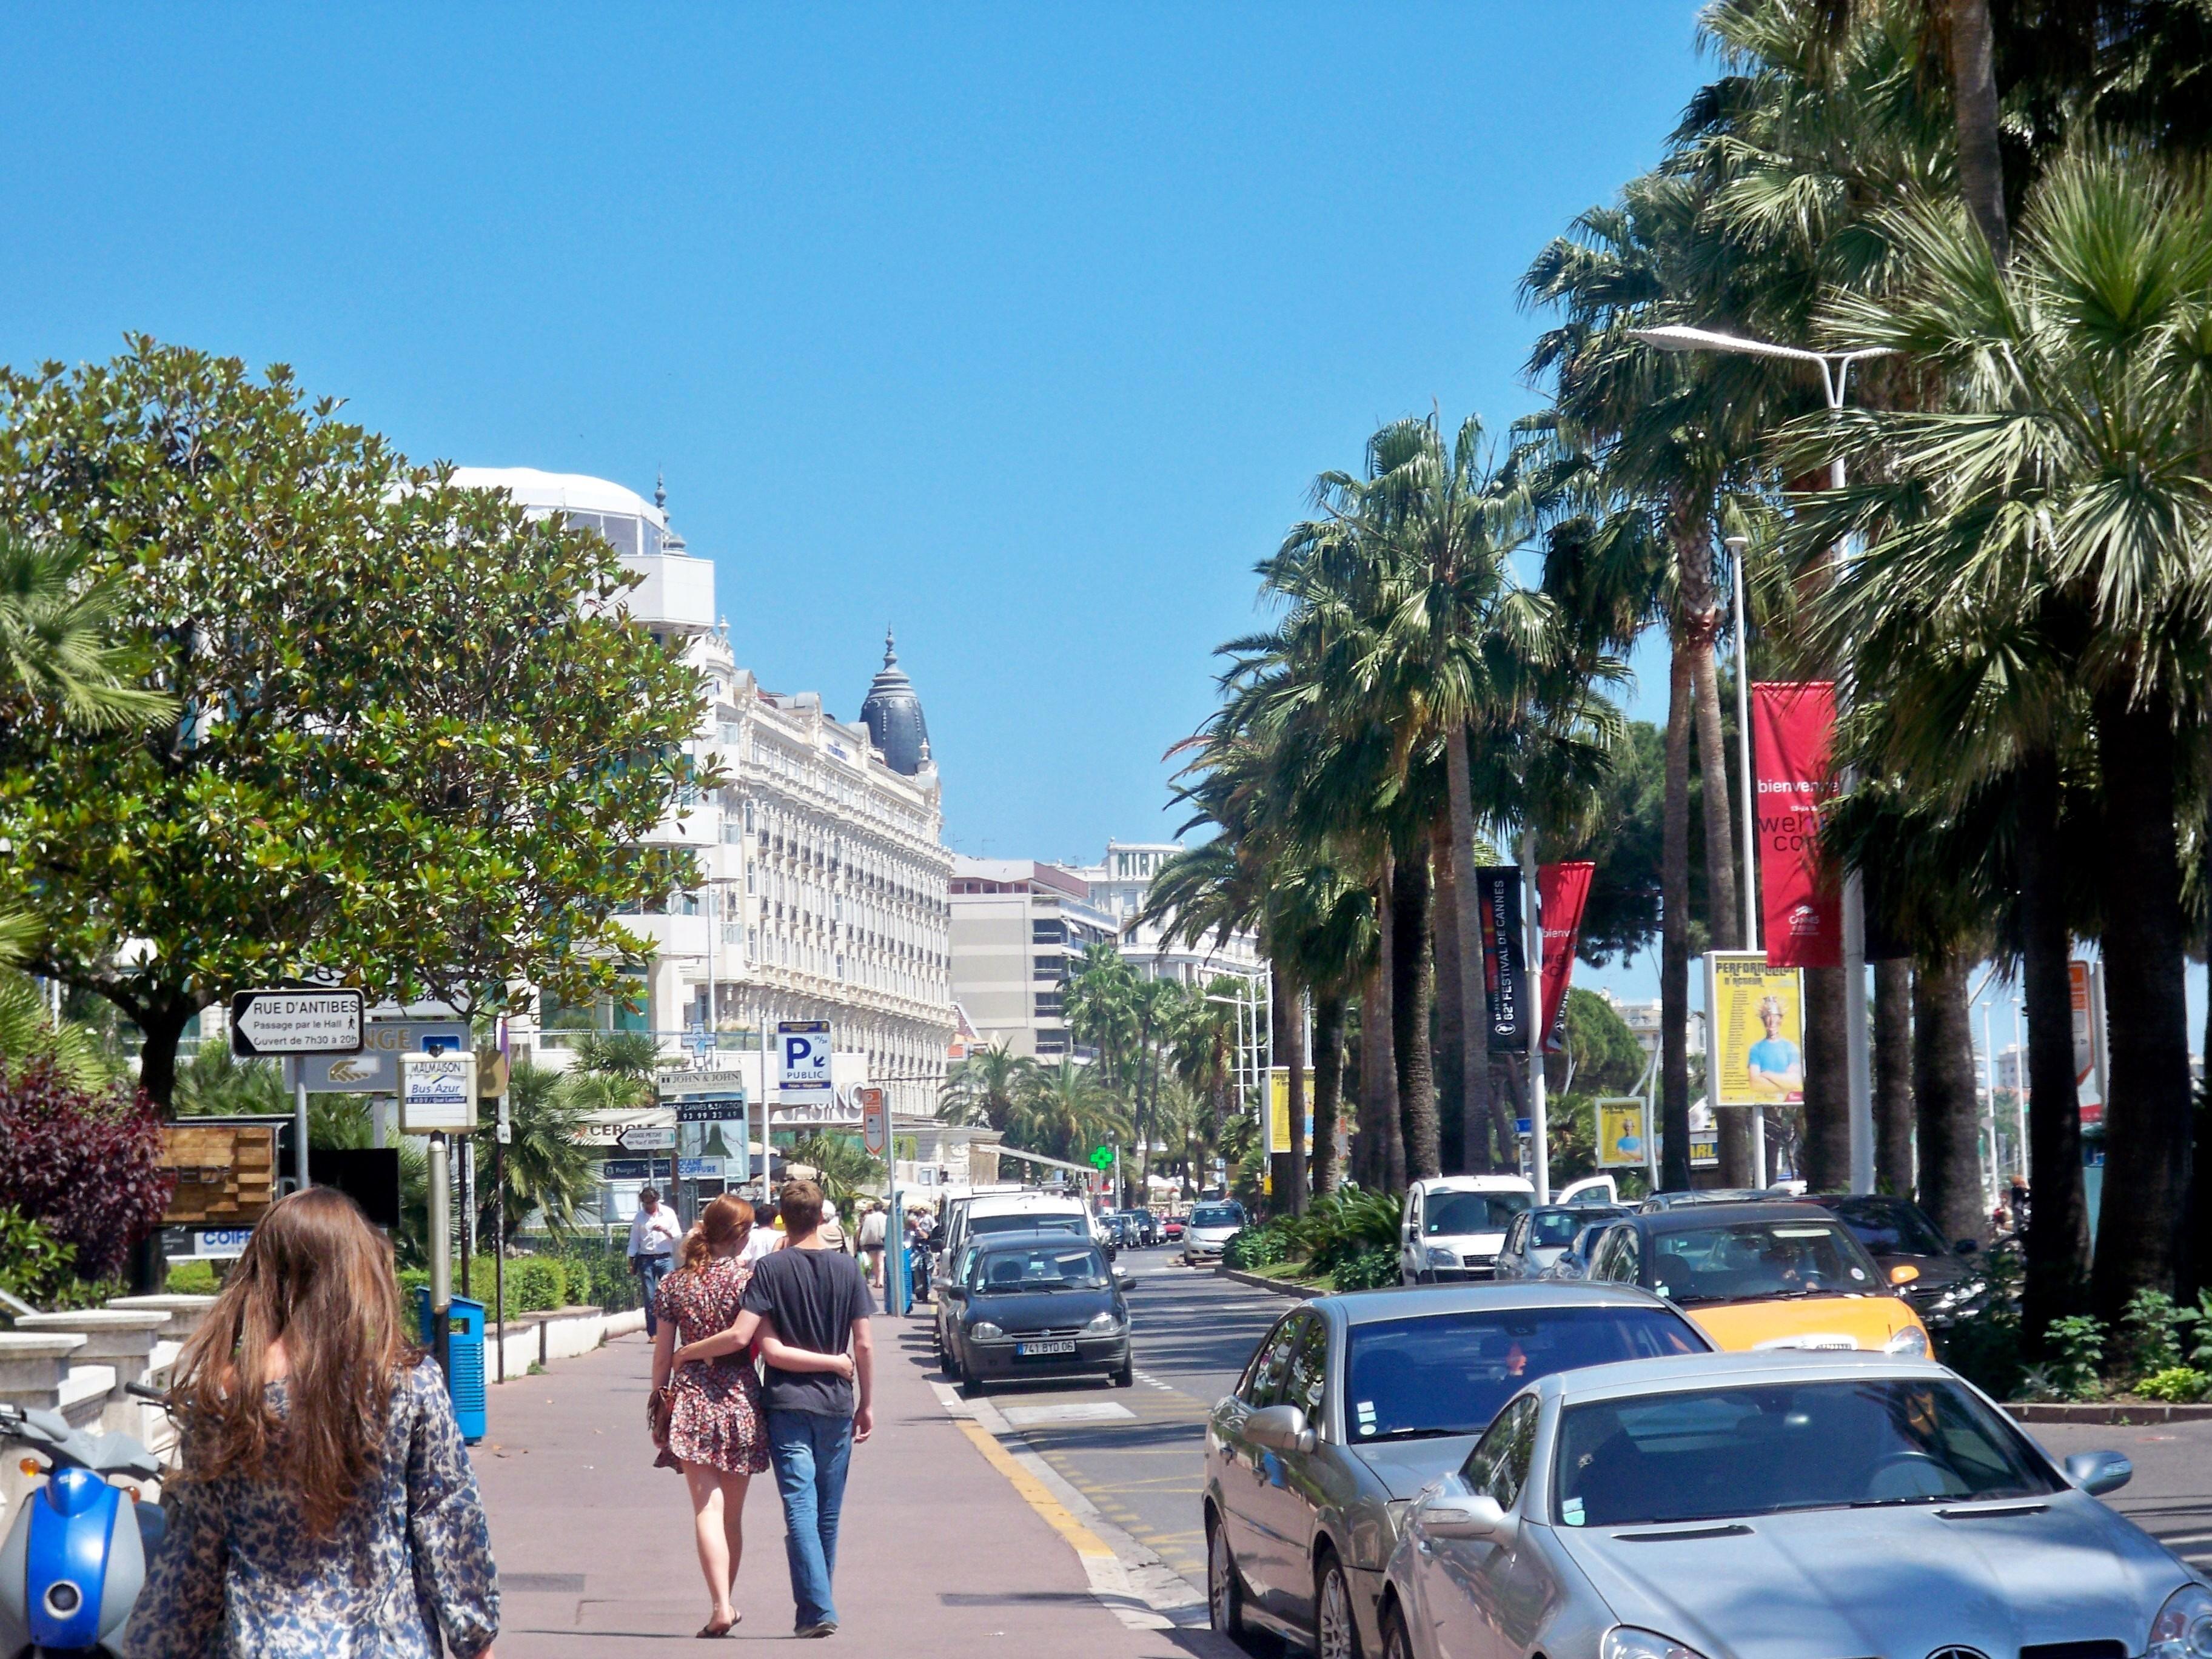 File:Cannes promenade.jpg - Wikimedia Commons